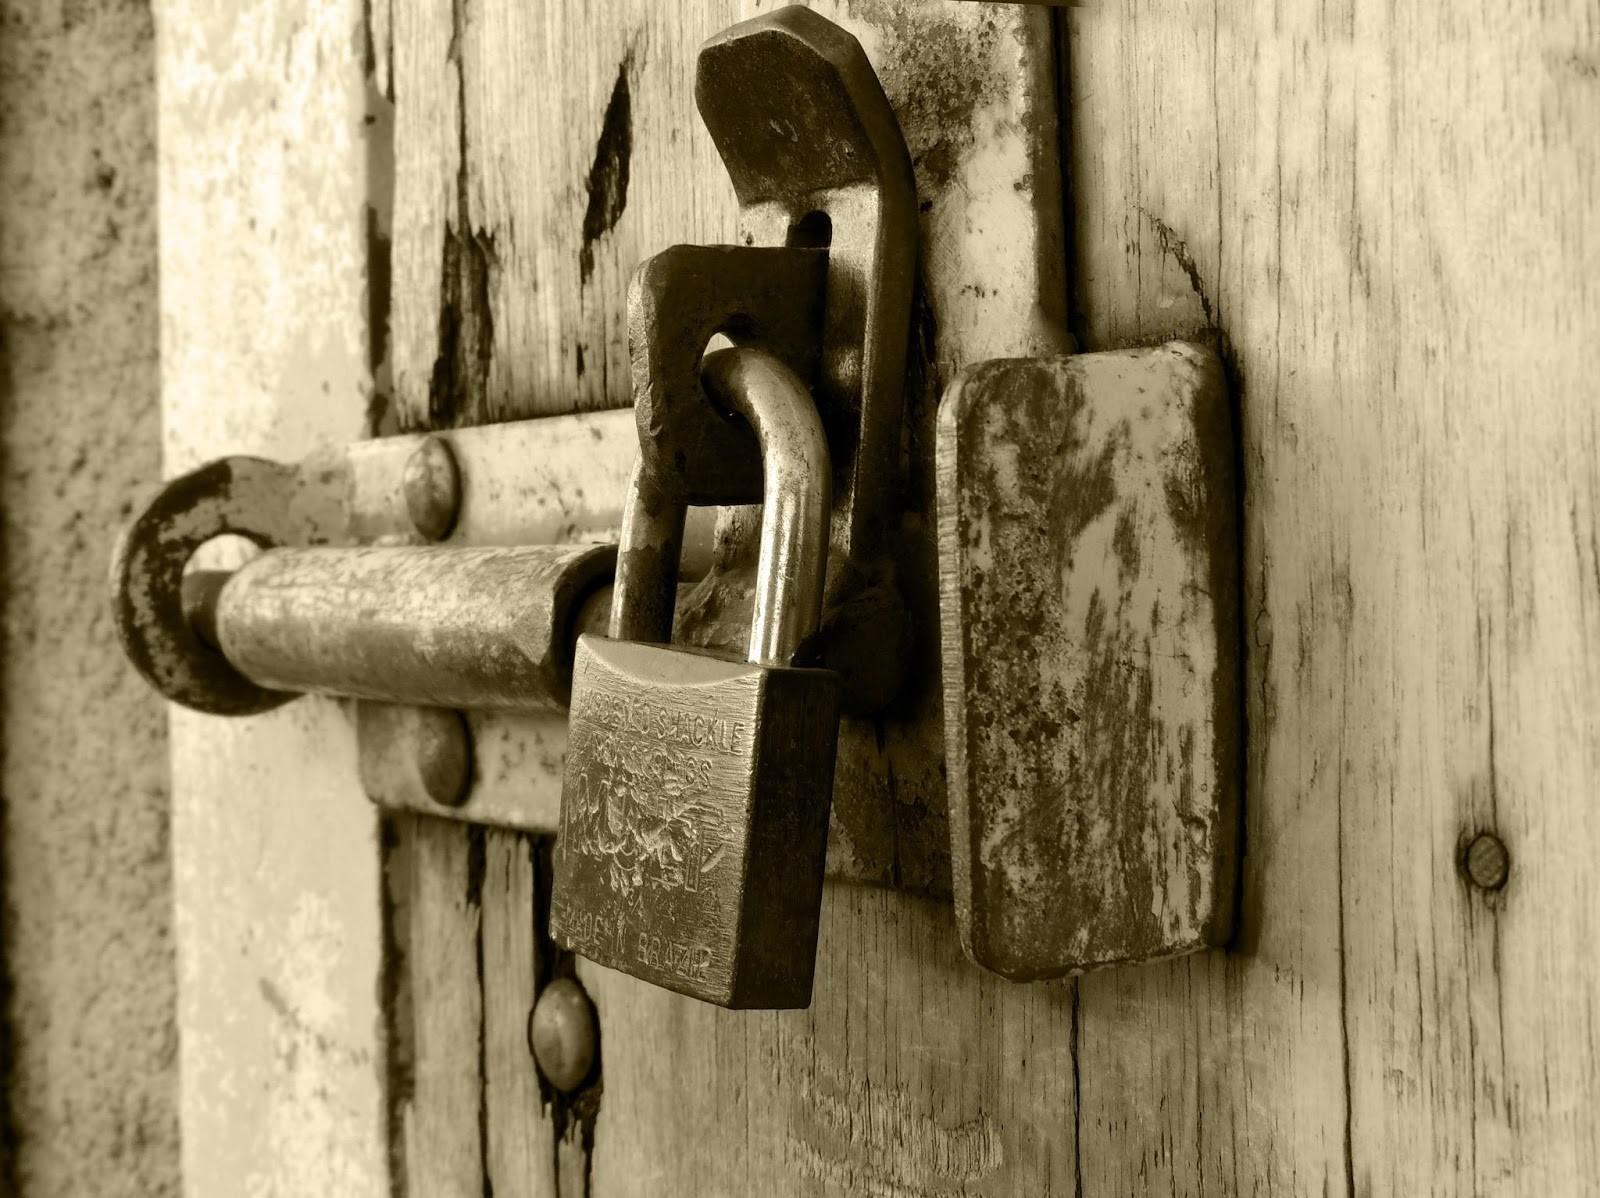 Increasing House Security And Decreasing Paranoia Levels padlock